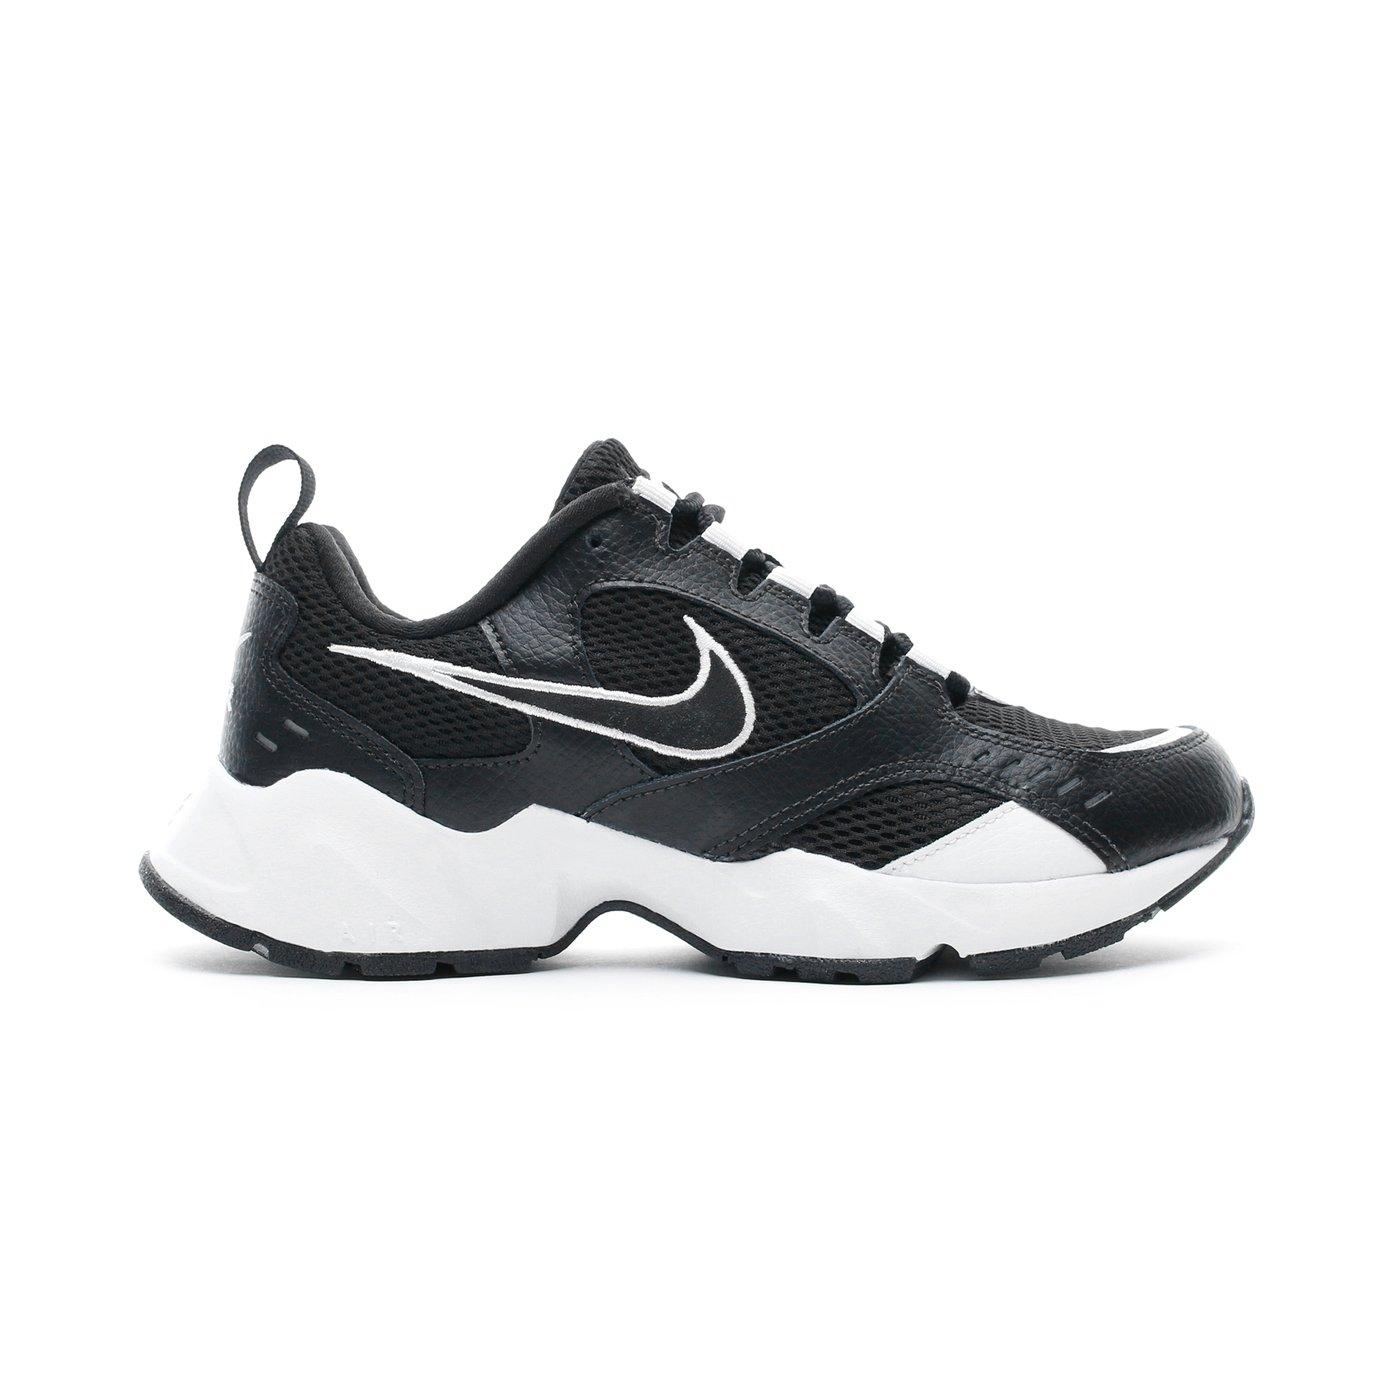 Кросівки жіночі Nike AIR HEIGHTS